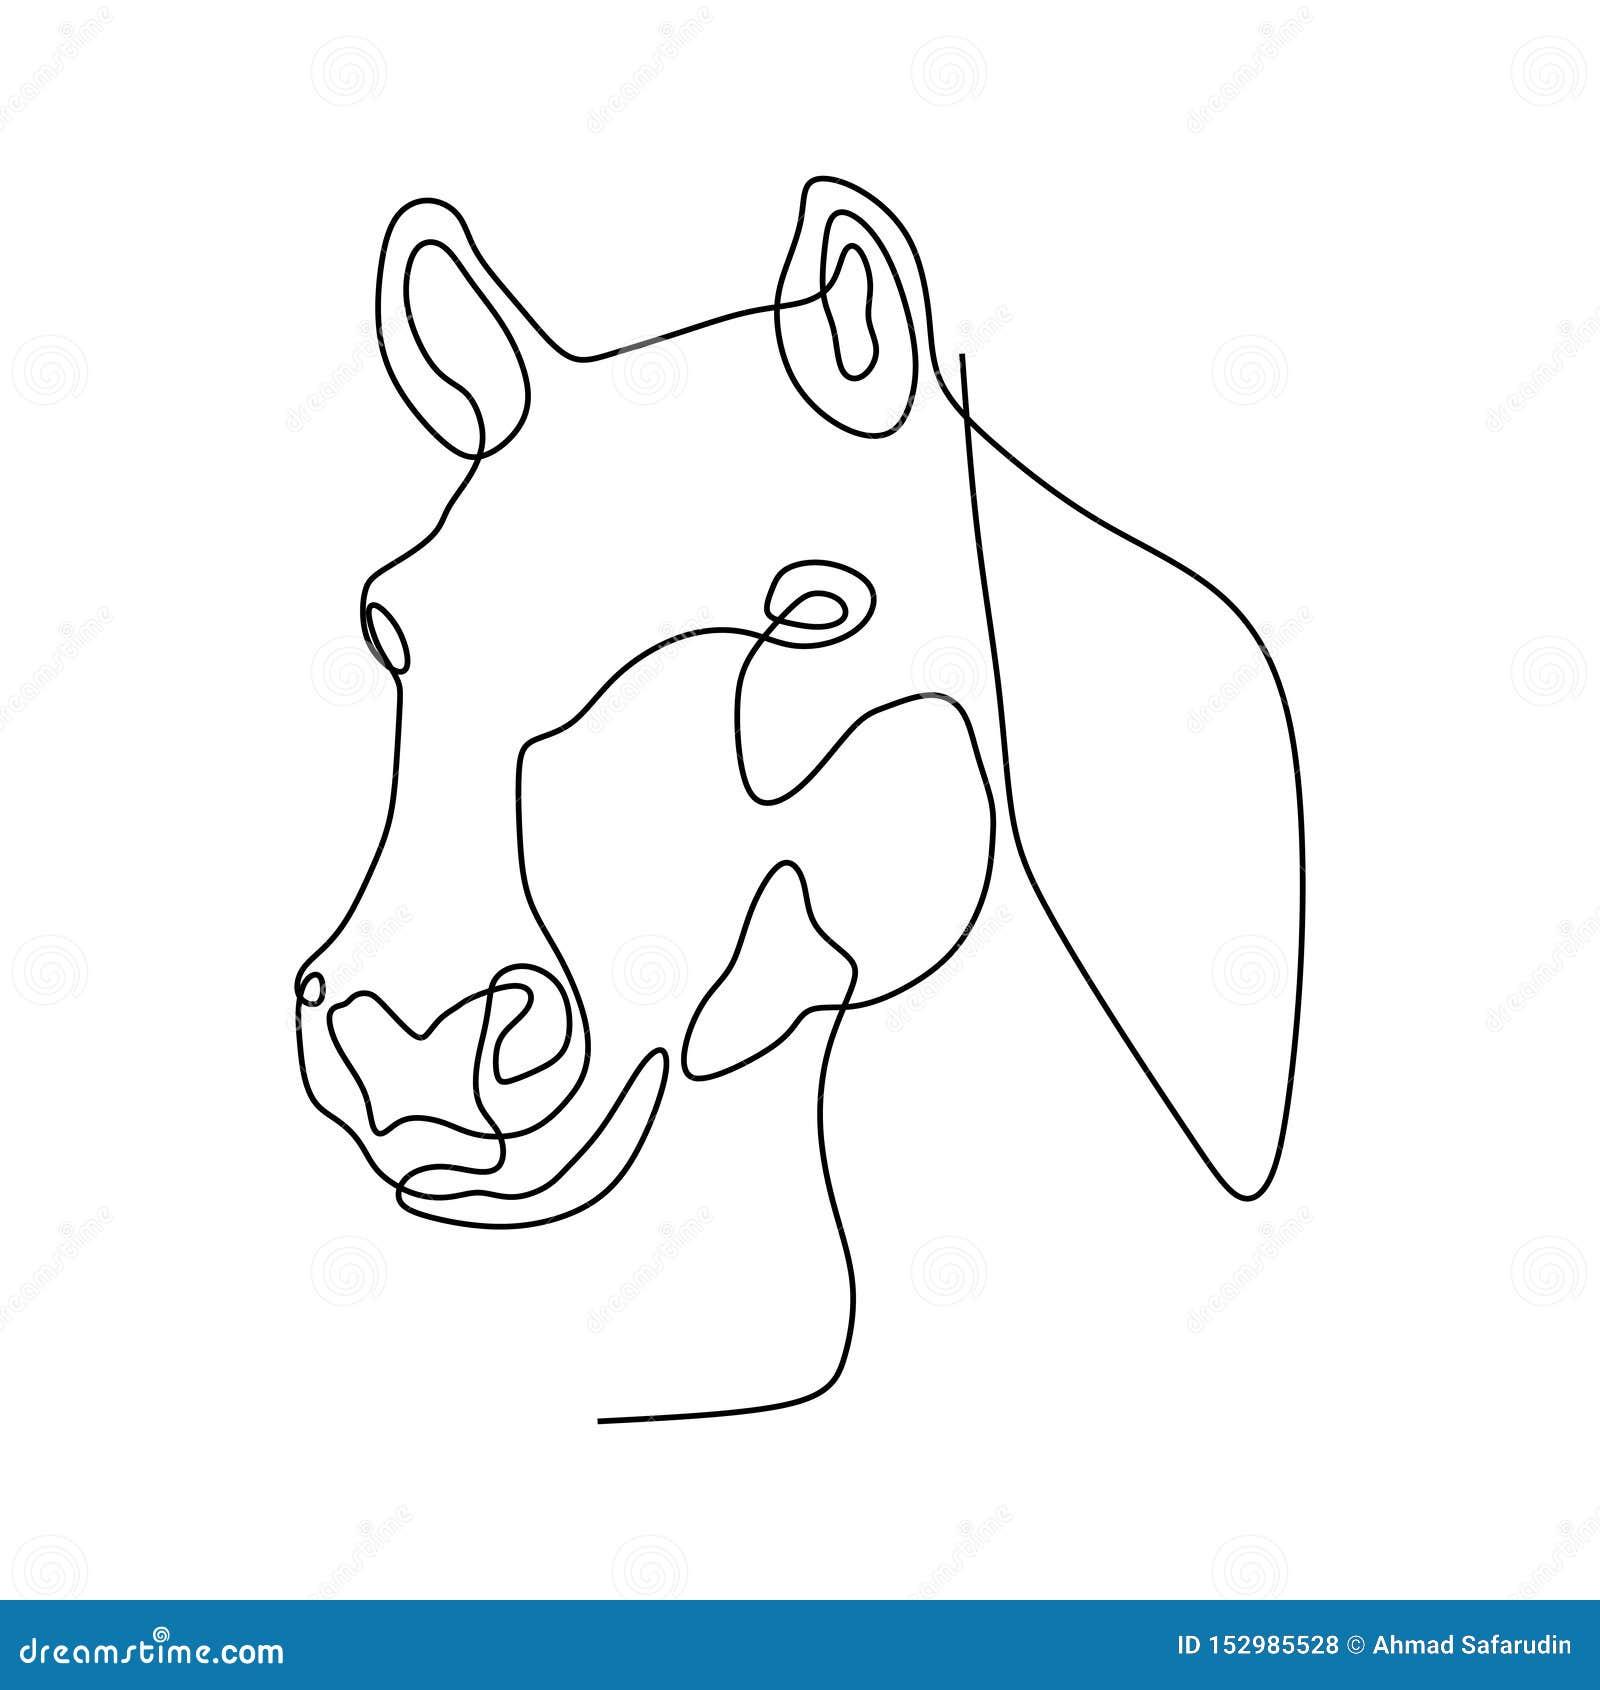 Continuous One Line Horse Head Minimalist Design Vector Illustration Minimalism Style Stock Photo Image Of Nice International 152985528